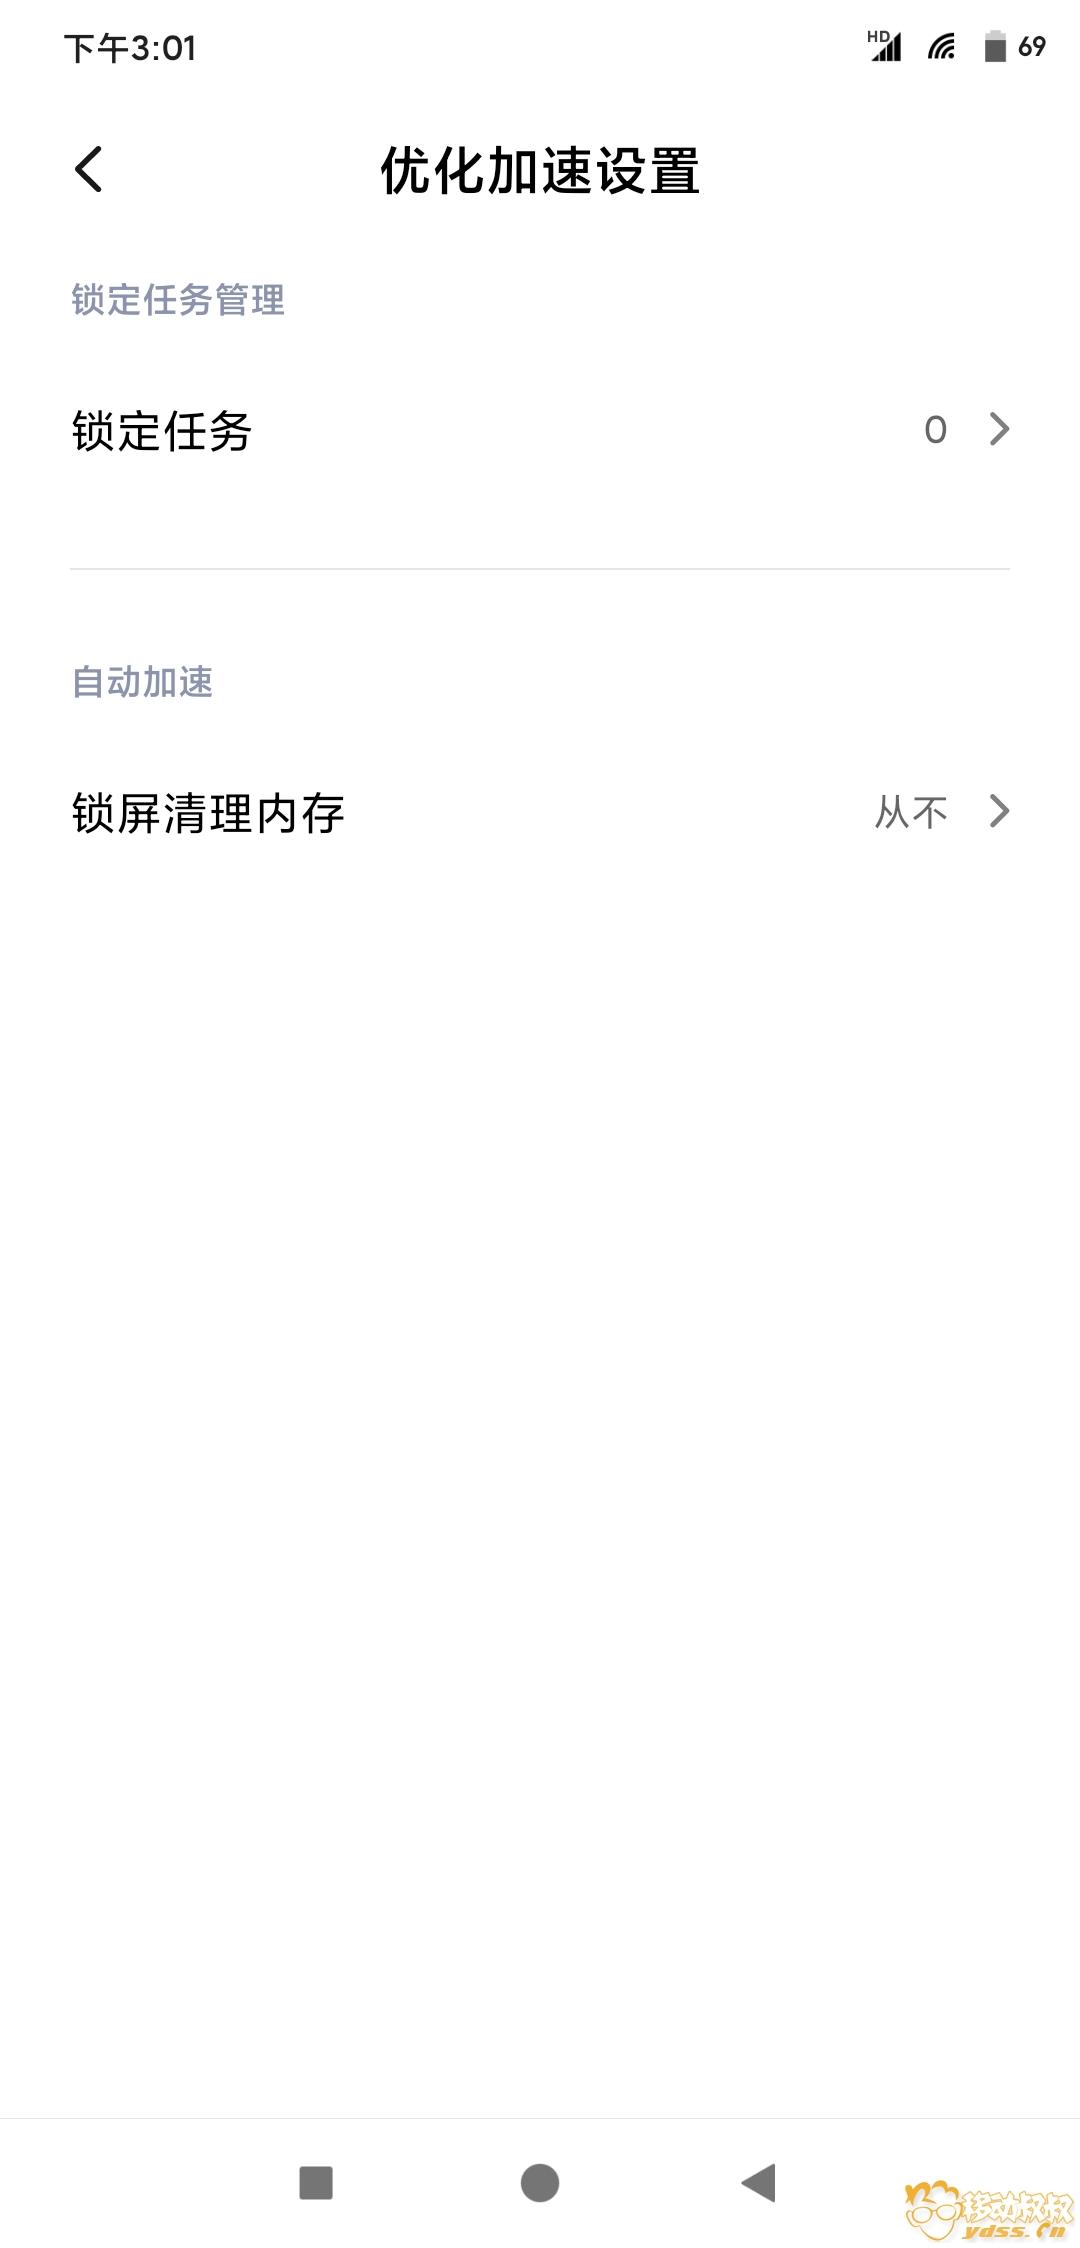 Screenshot_2020-02-11-15-01-38-586_com.miui.securitycenter.jpg